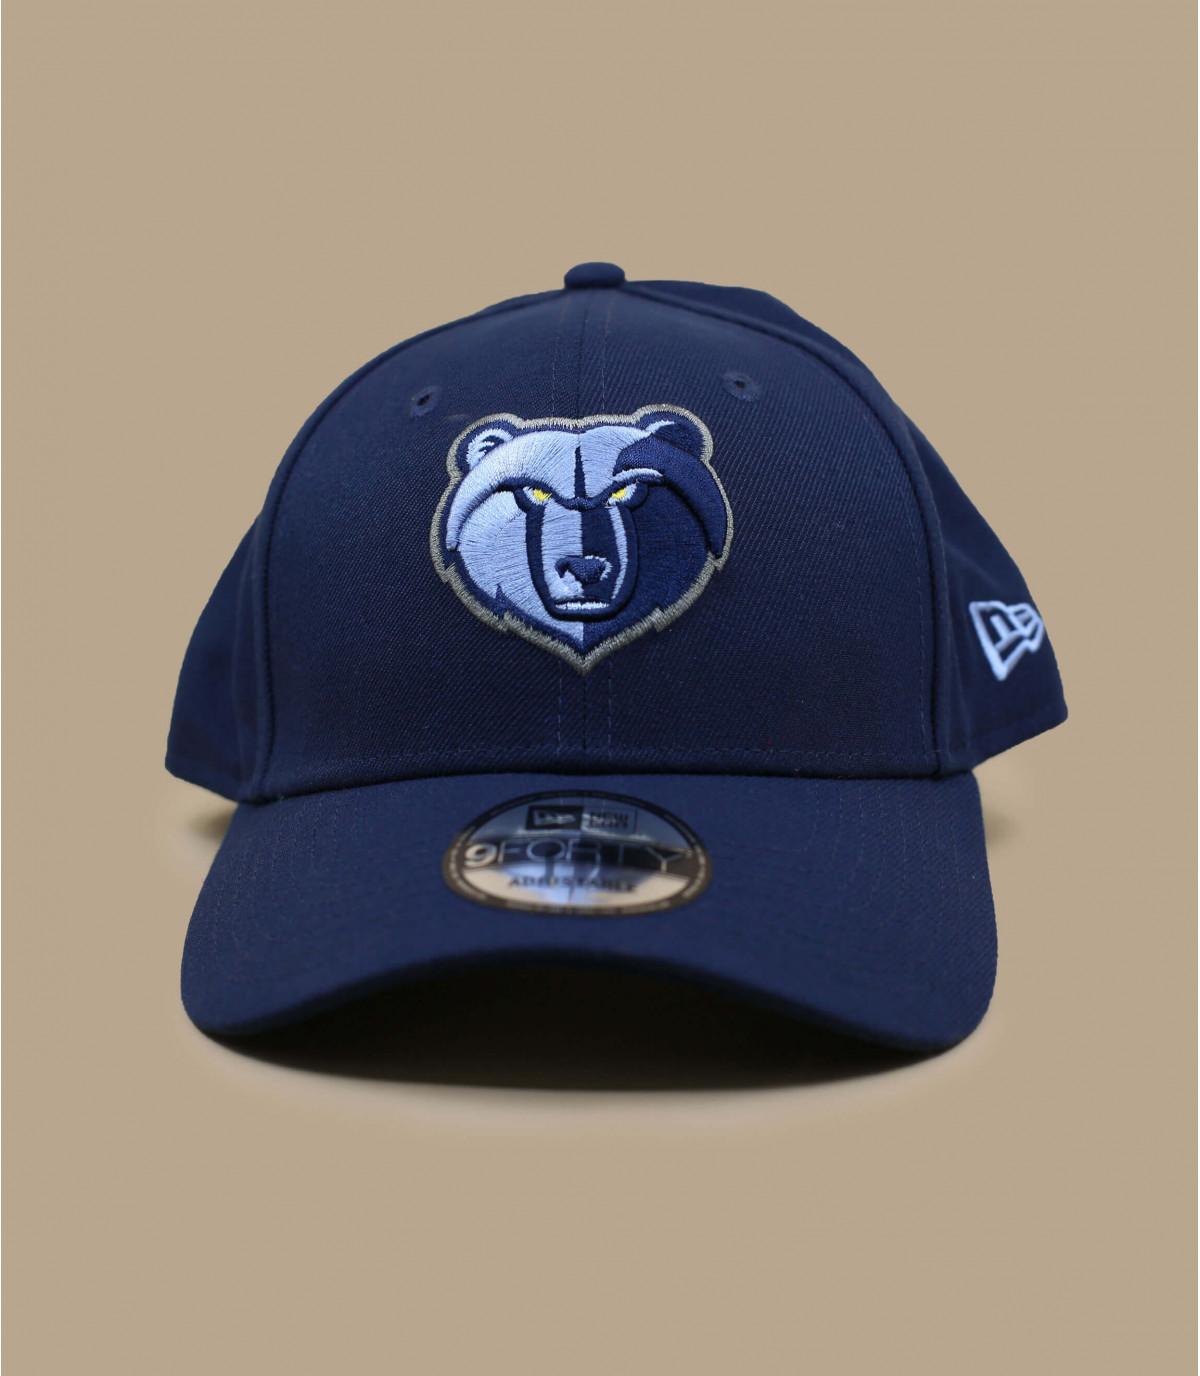 casquette Grizzlies bleu marine